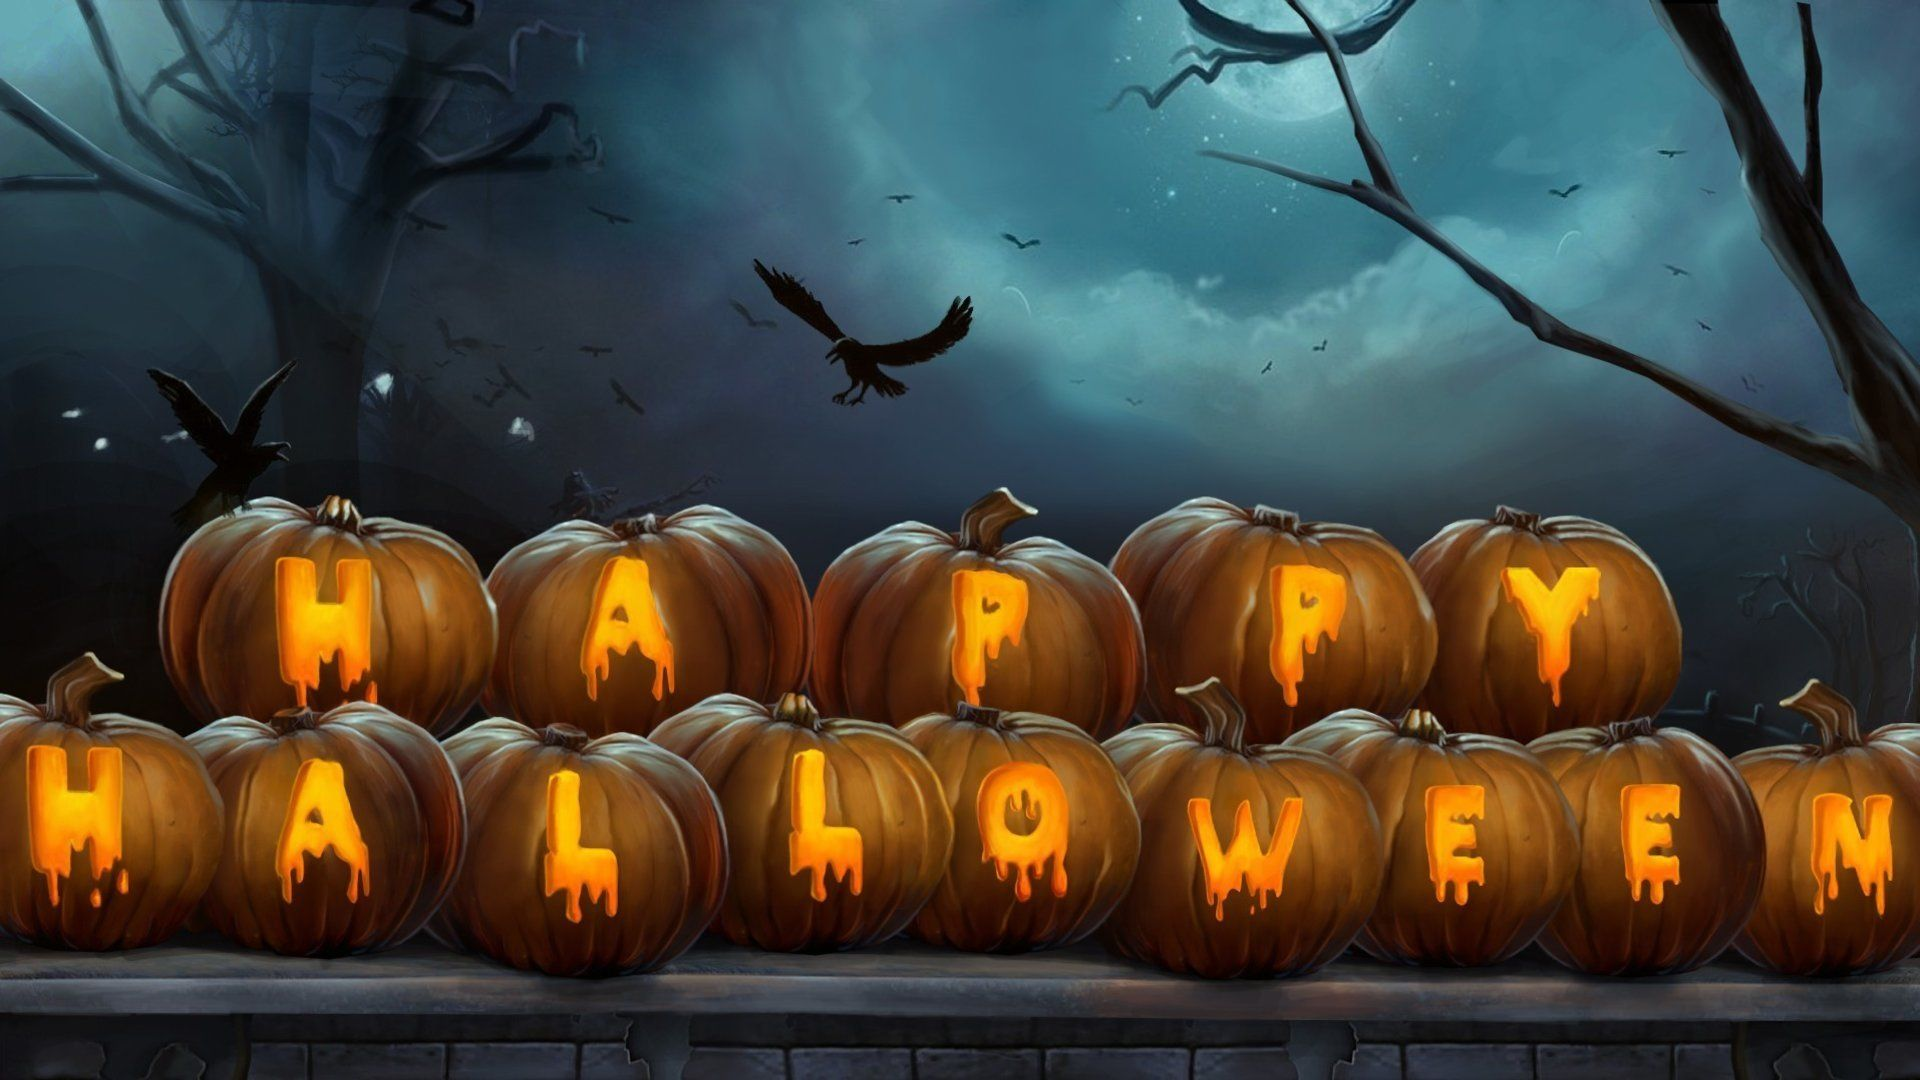 Download Wallpaper Halloween Pinterest - 76858ba5c2fb36d6c6f843ca255e7bbb  Gallery_585819.jpg